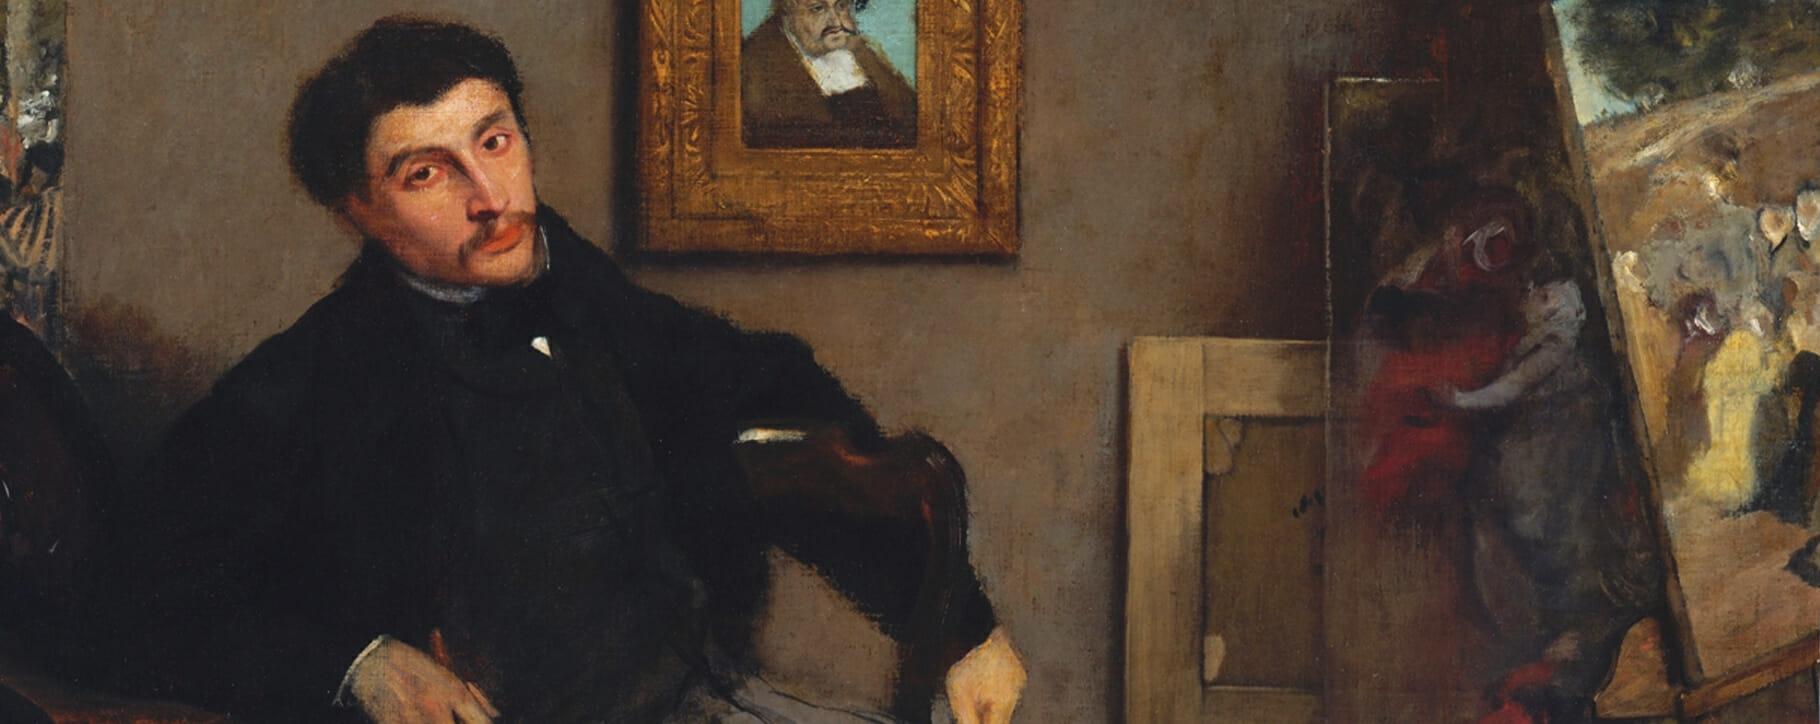 19th century painting Degas Tissot studio